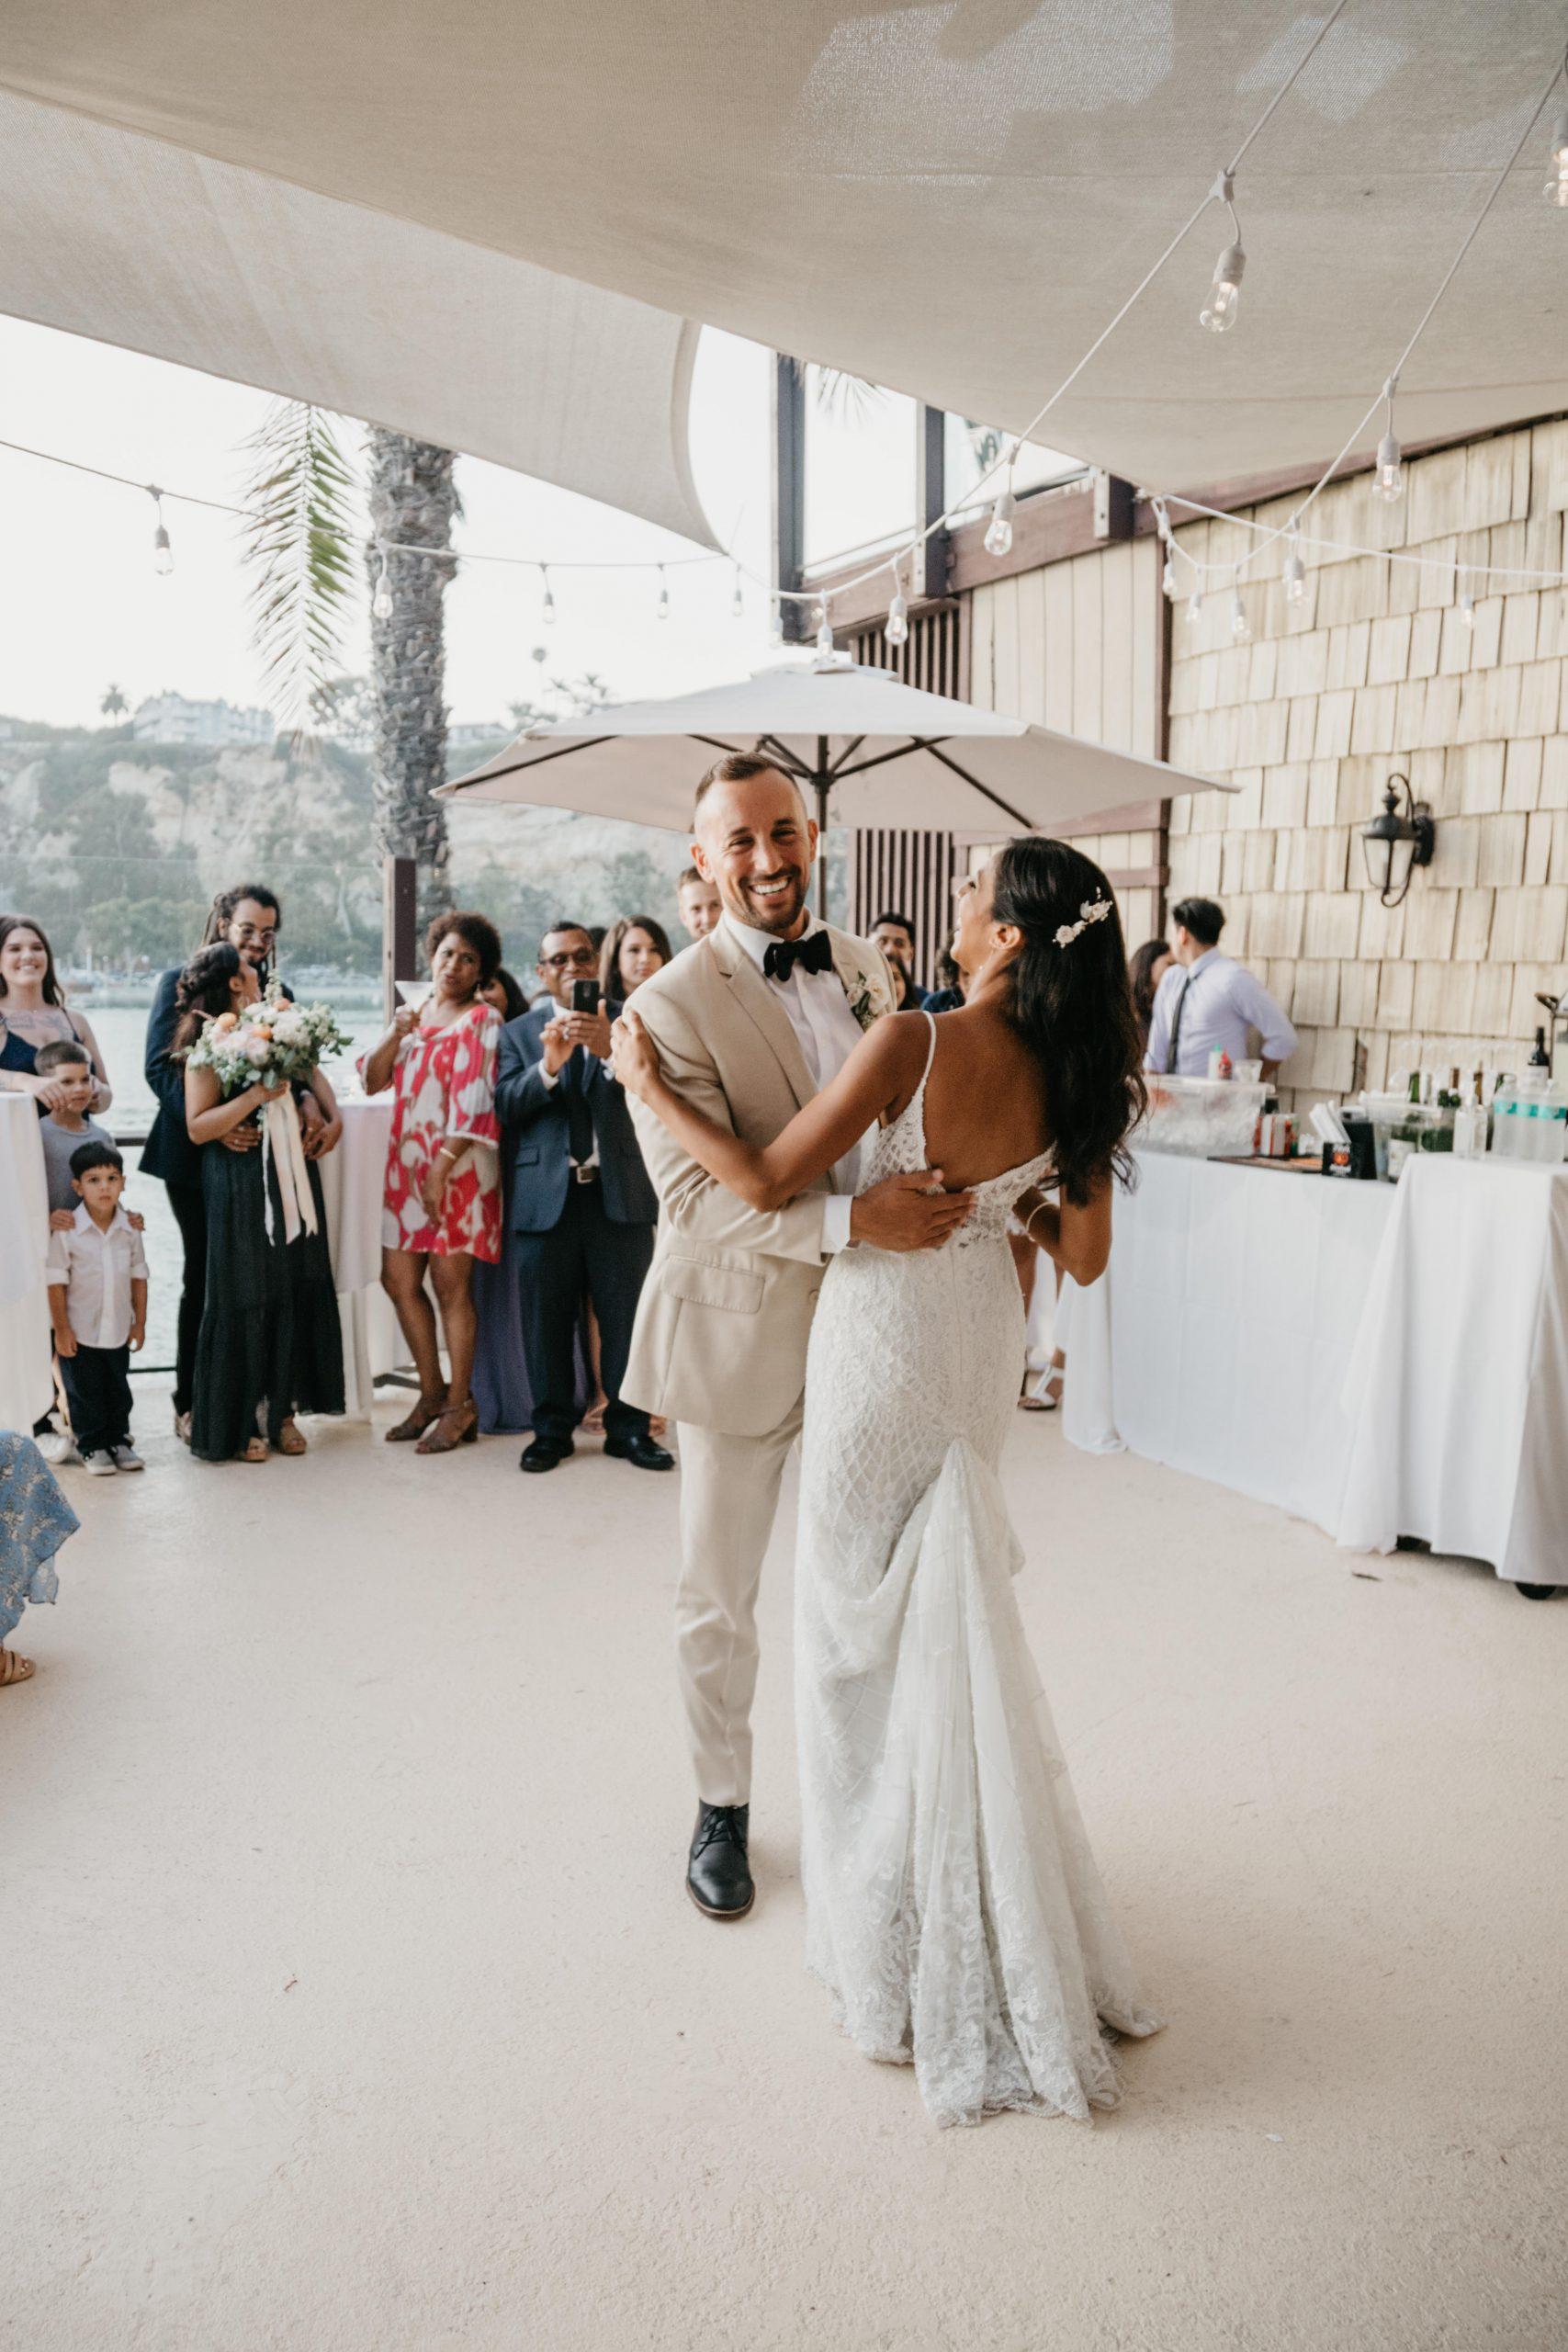 Dana Point Yacht Club Wedding, The Montage Laguna Beach Wedding Bridal Portraits, image by Fatima Elreda Photo